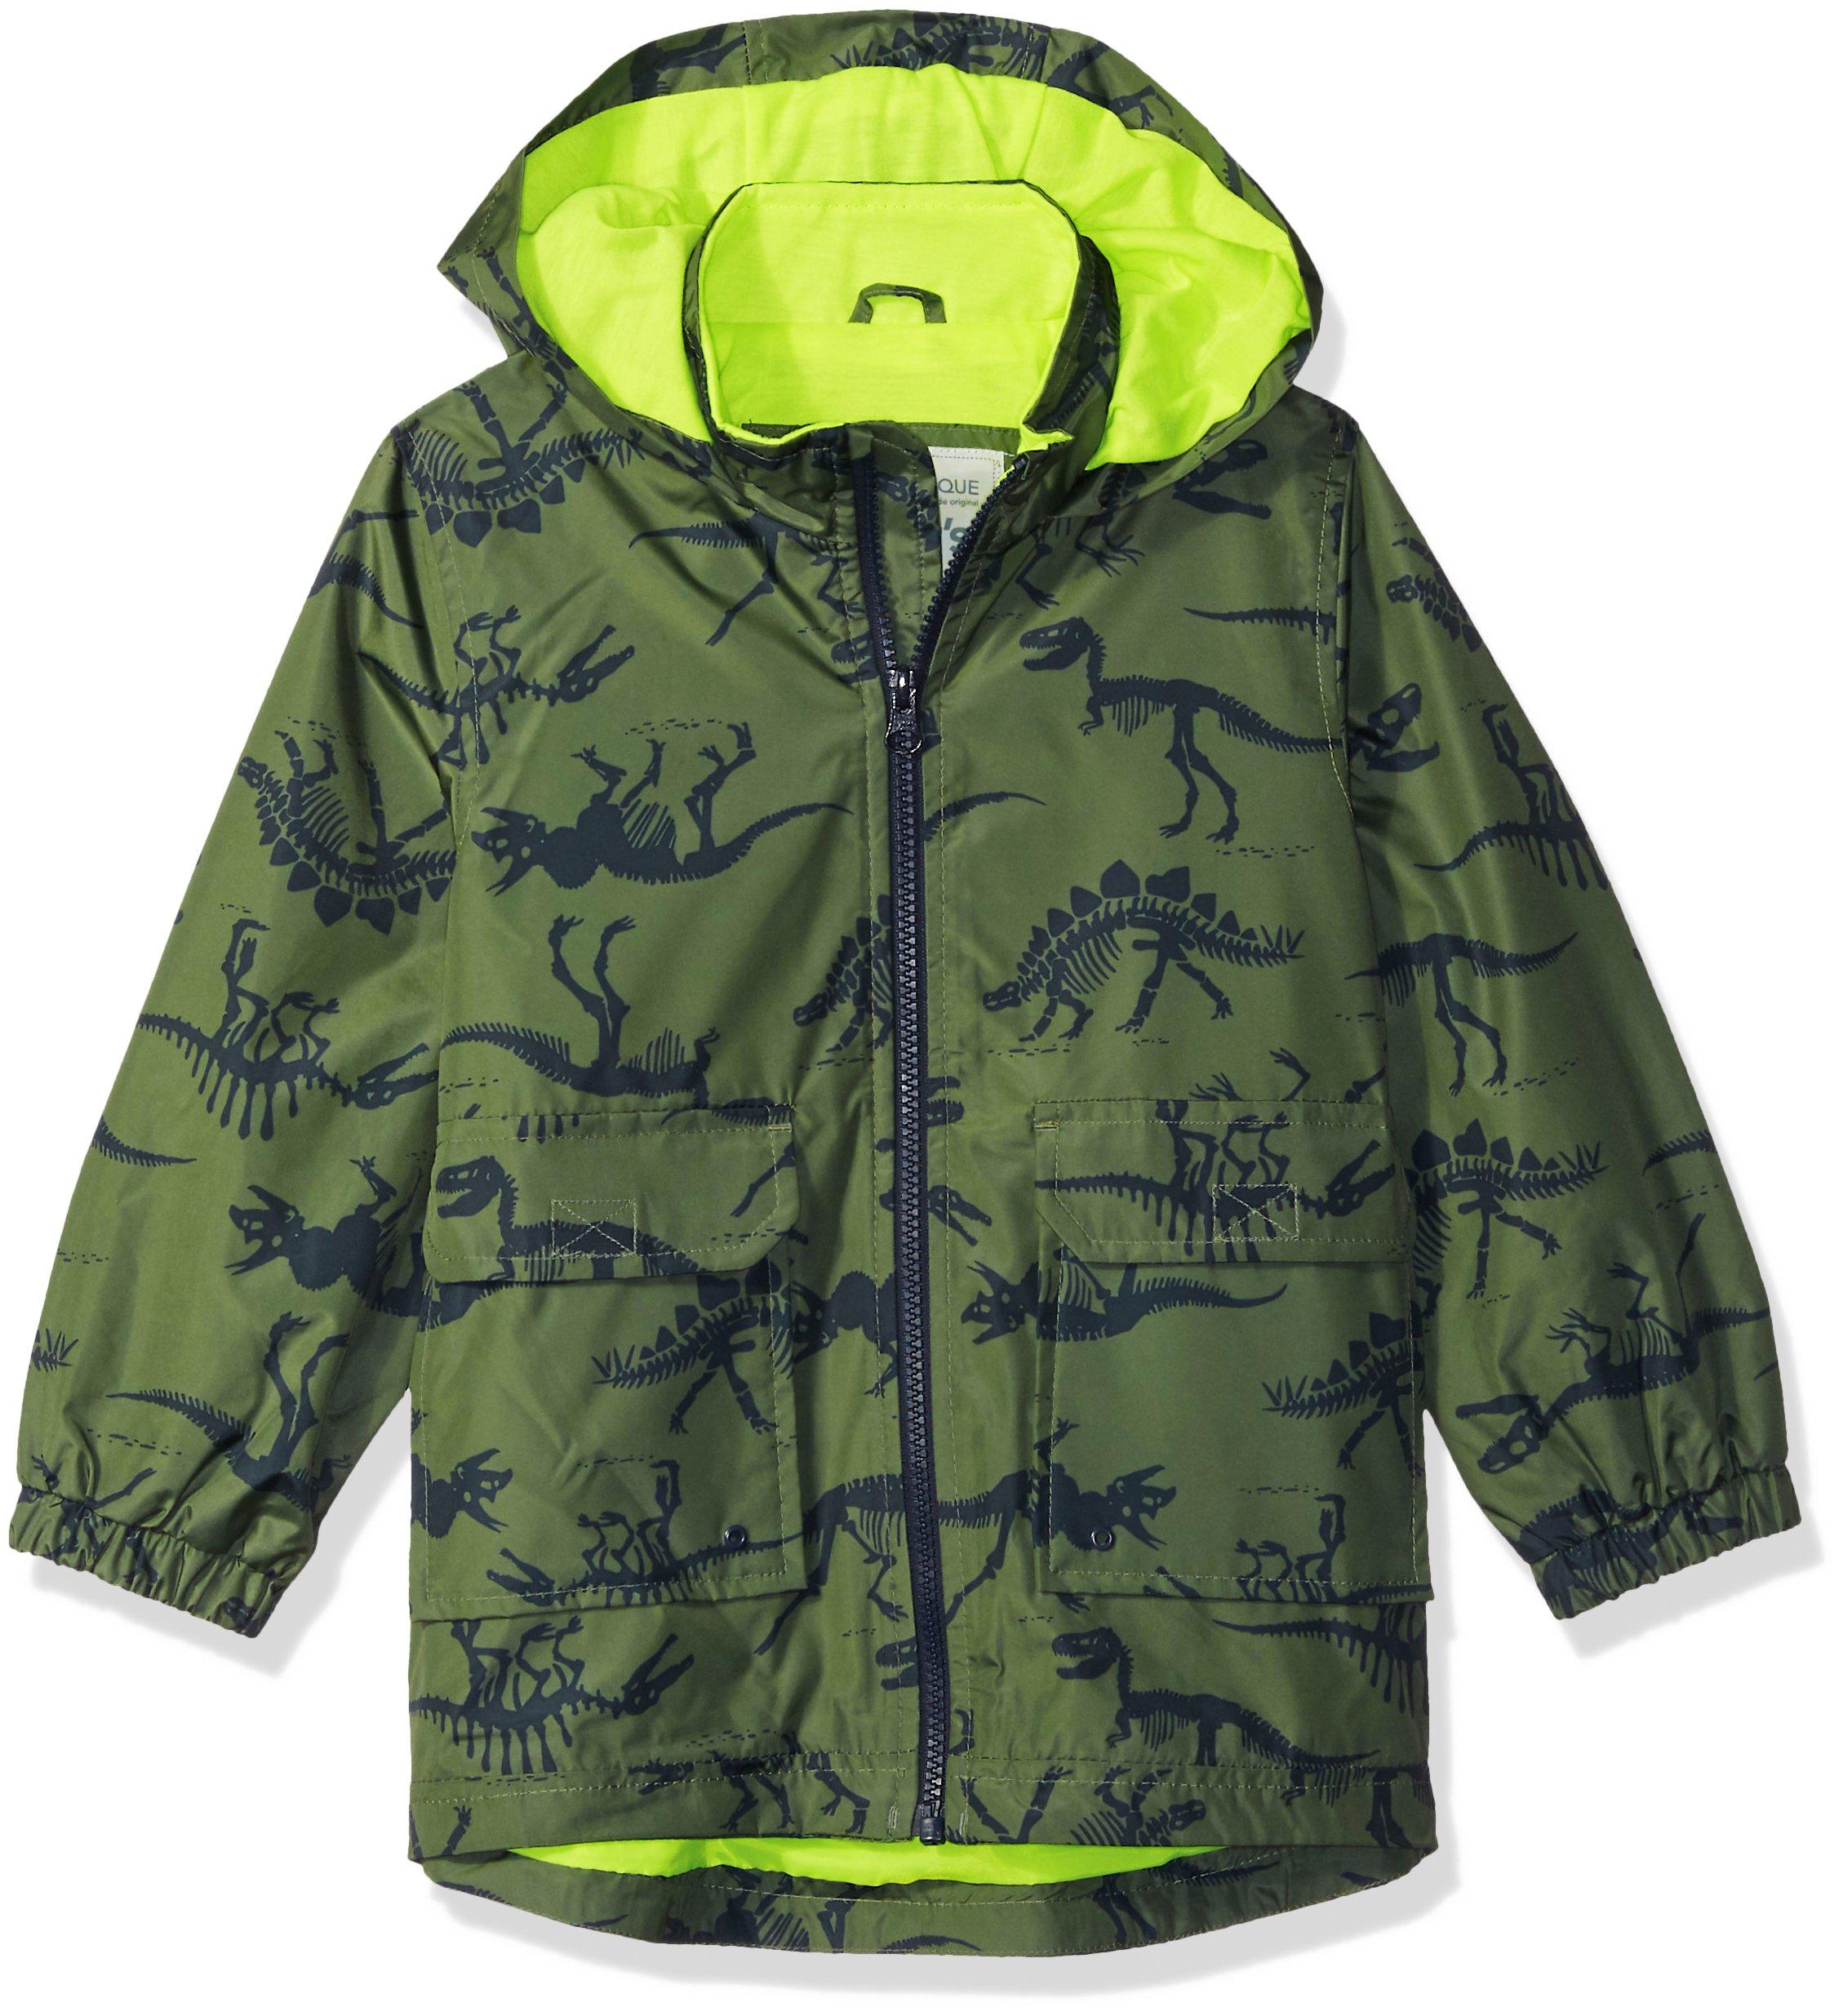 Carters Little Favorite Rainslicker Dinosaur